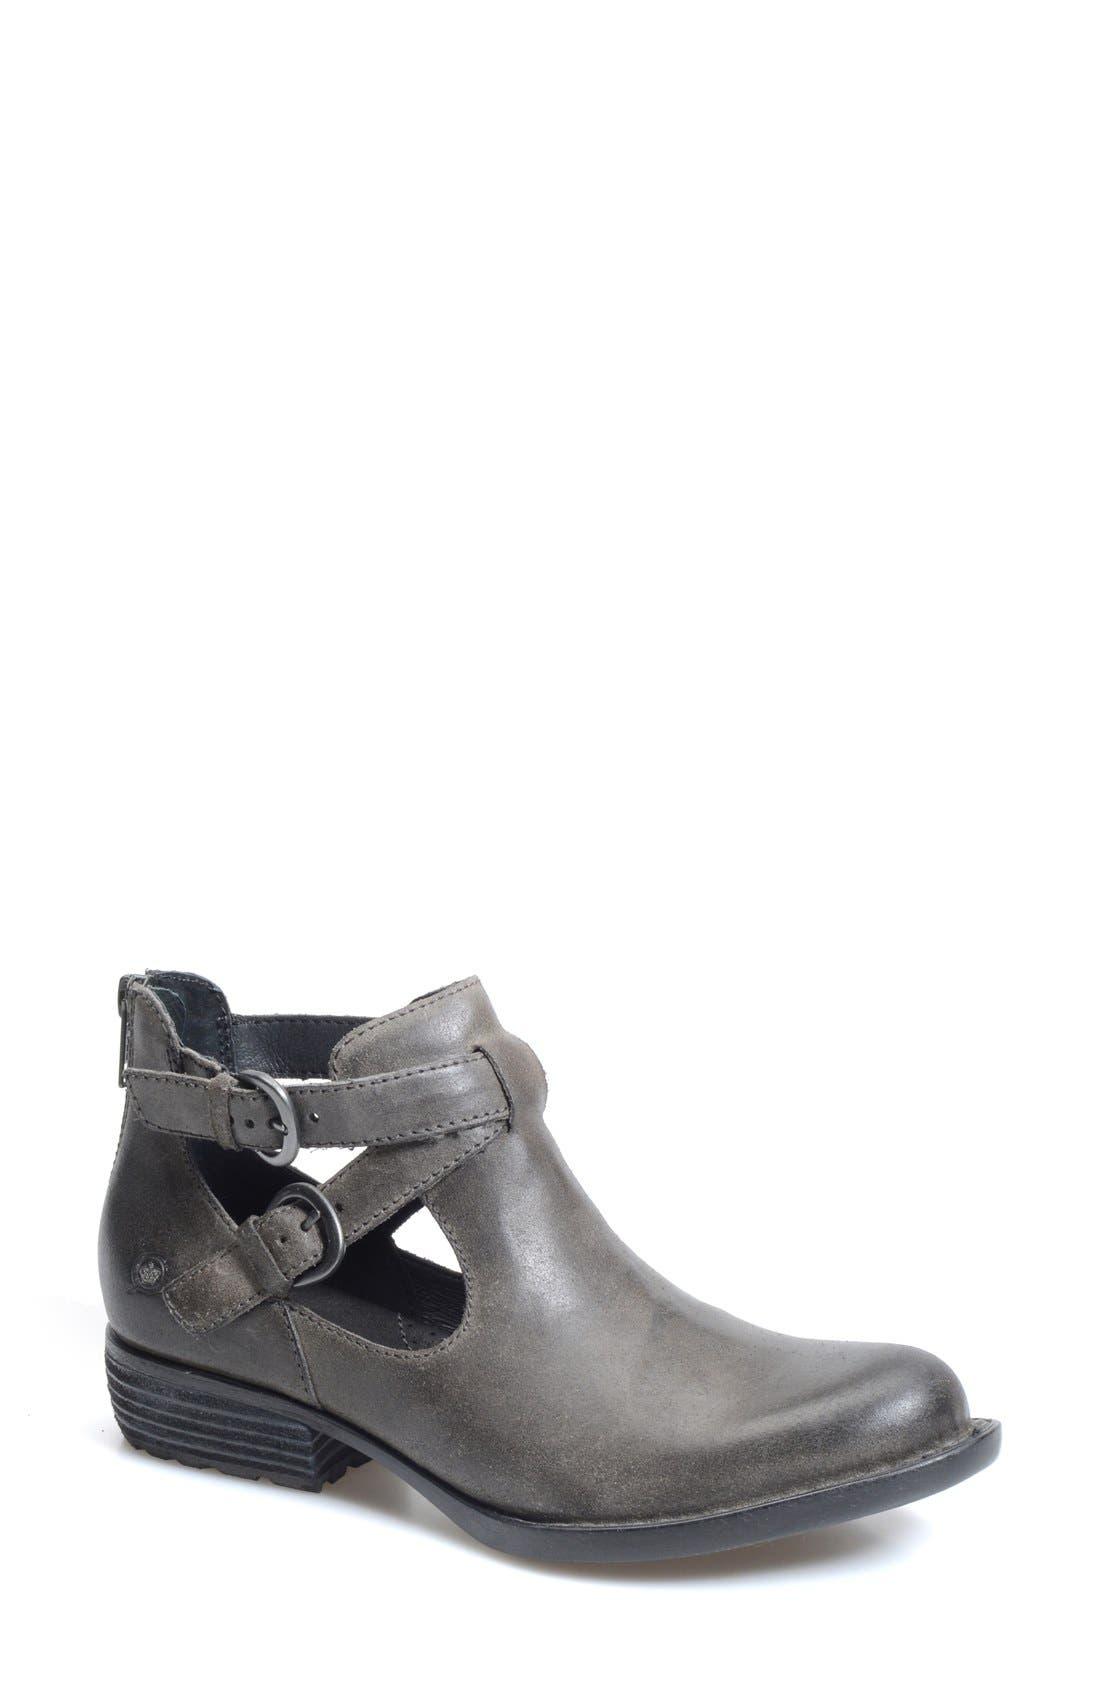 Main Image - Børn 'Kamilla' Cutout Ankle Boot (Women)